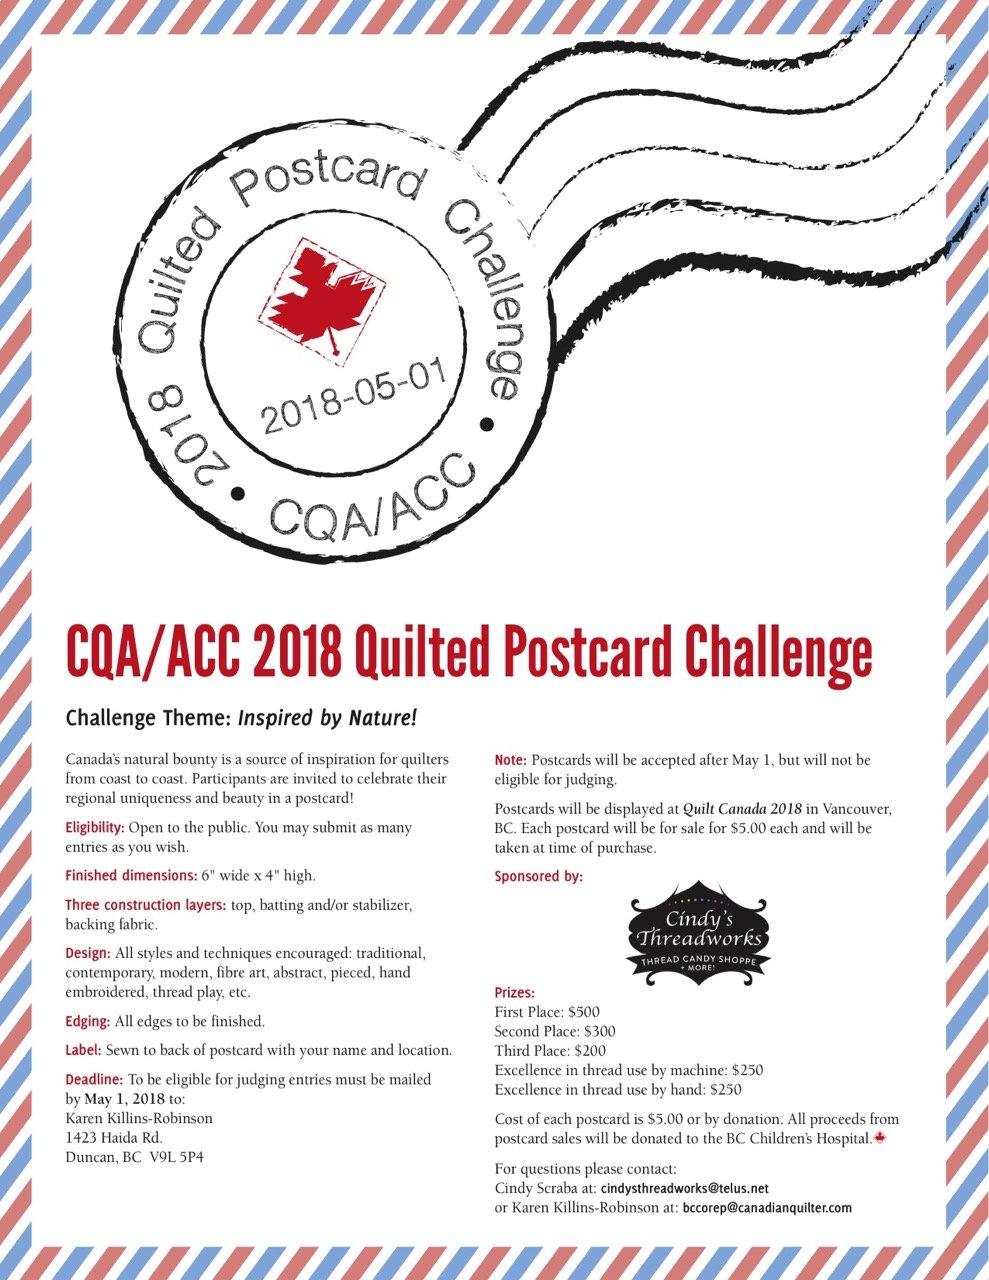 CQA POSTCARD CHALLENGE 6x4 Stabilizer Promotion